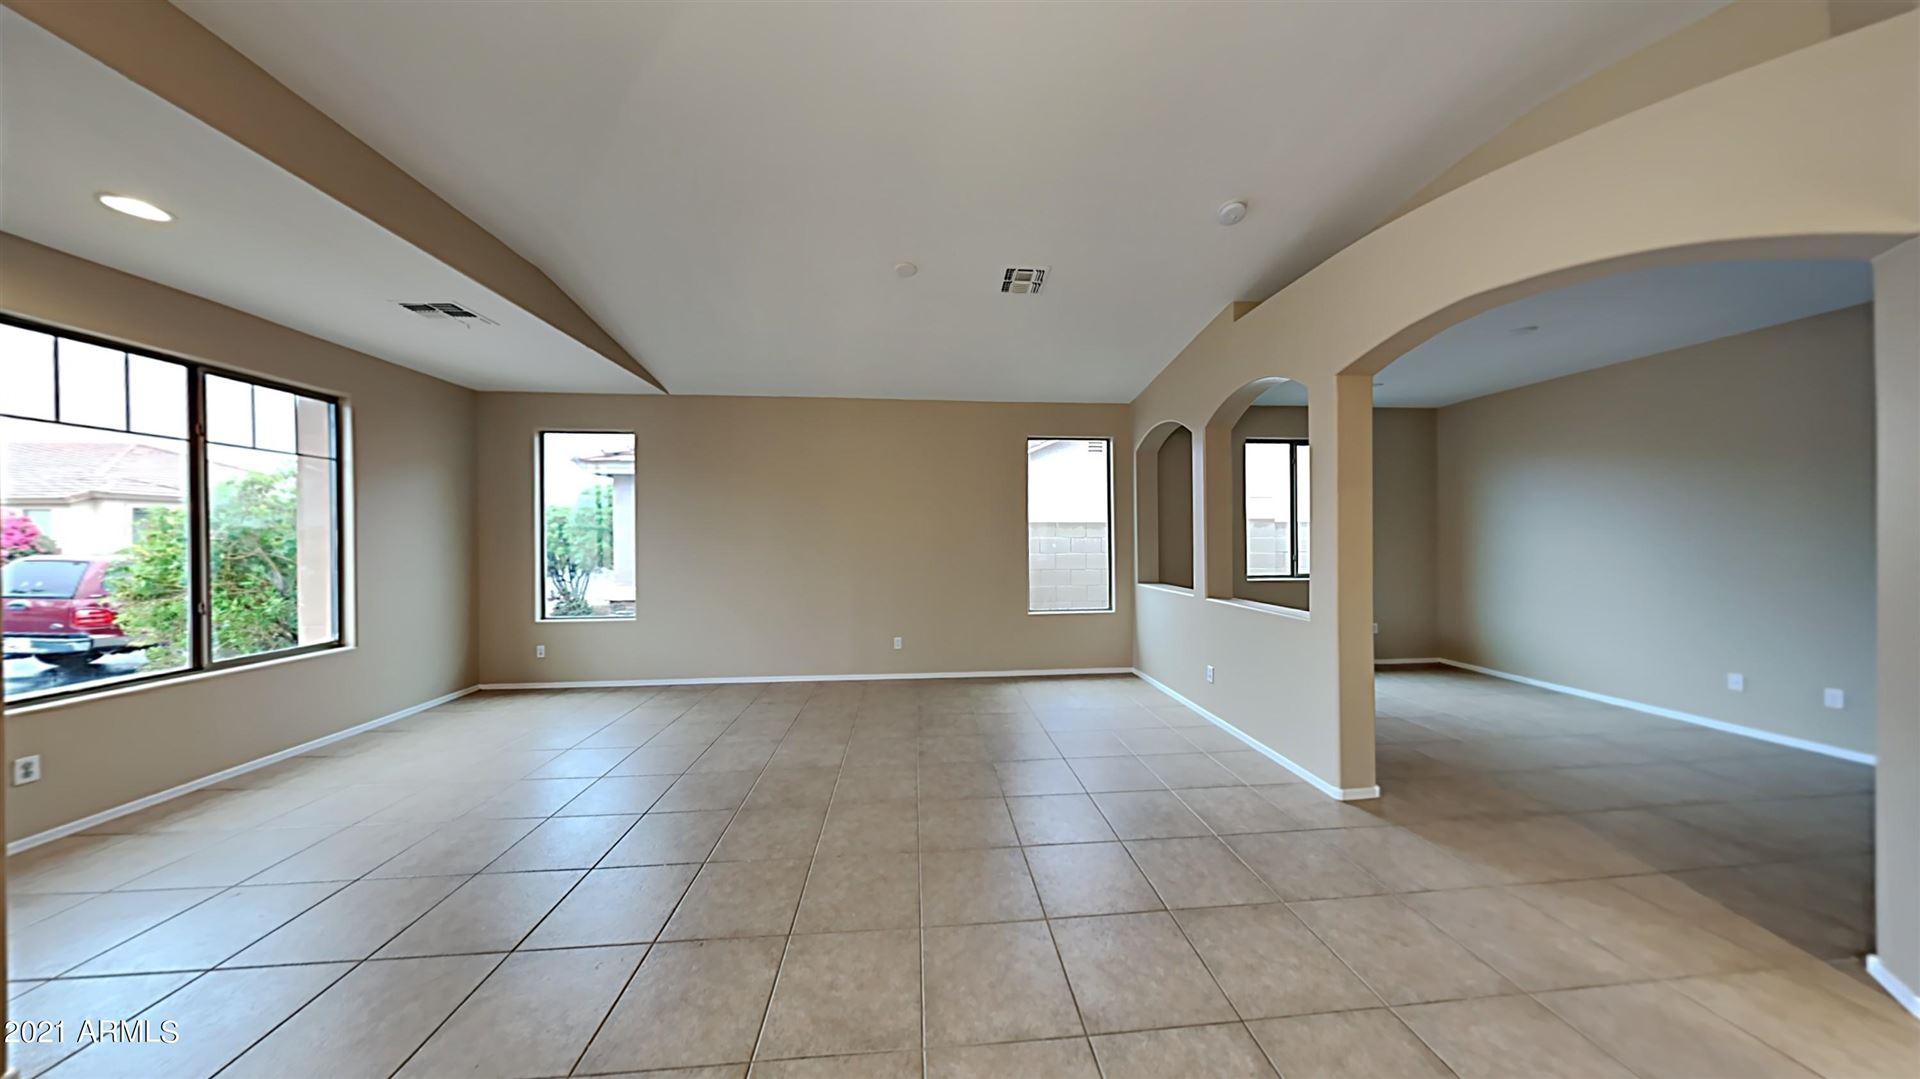 Photo of 9419 W HEBER Road, Tolleson, AZ 85353 (MLS # 6270601)